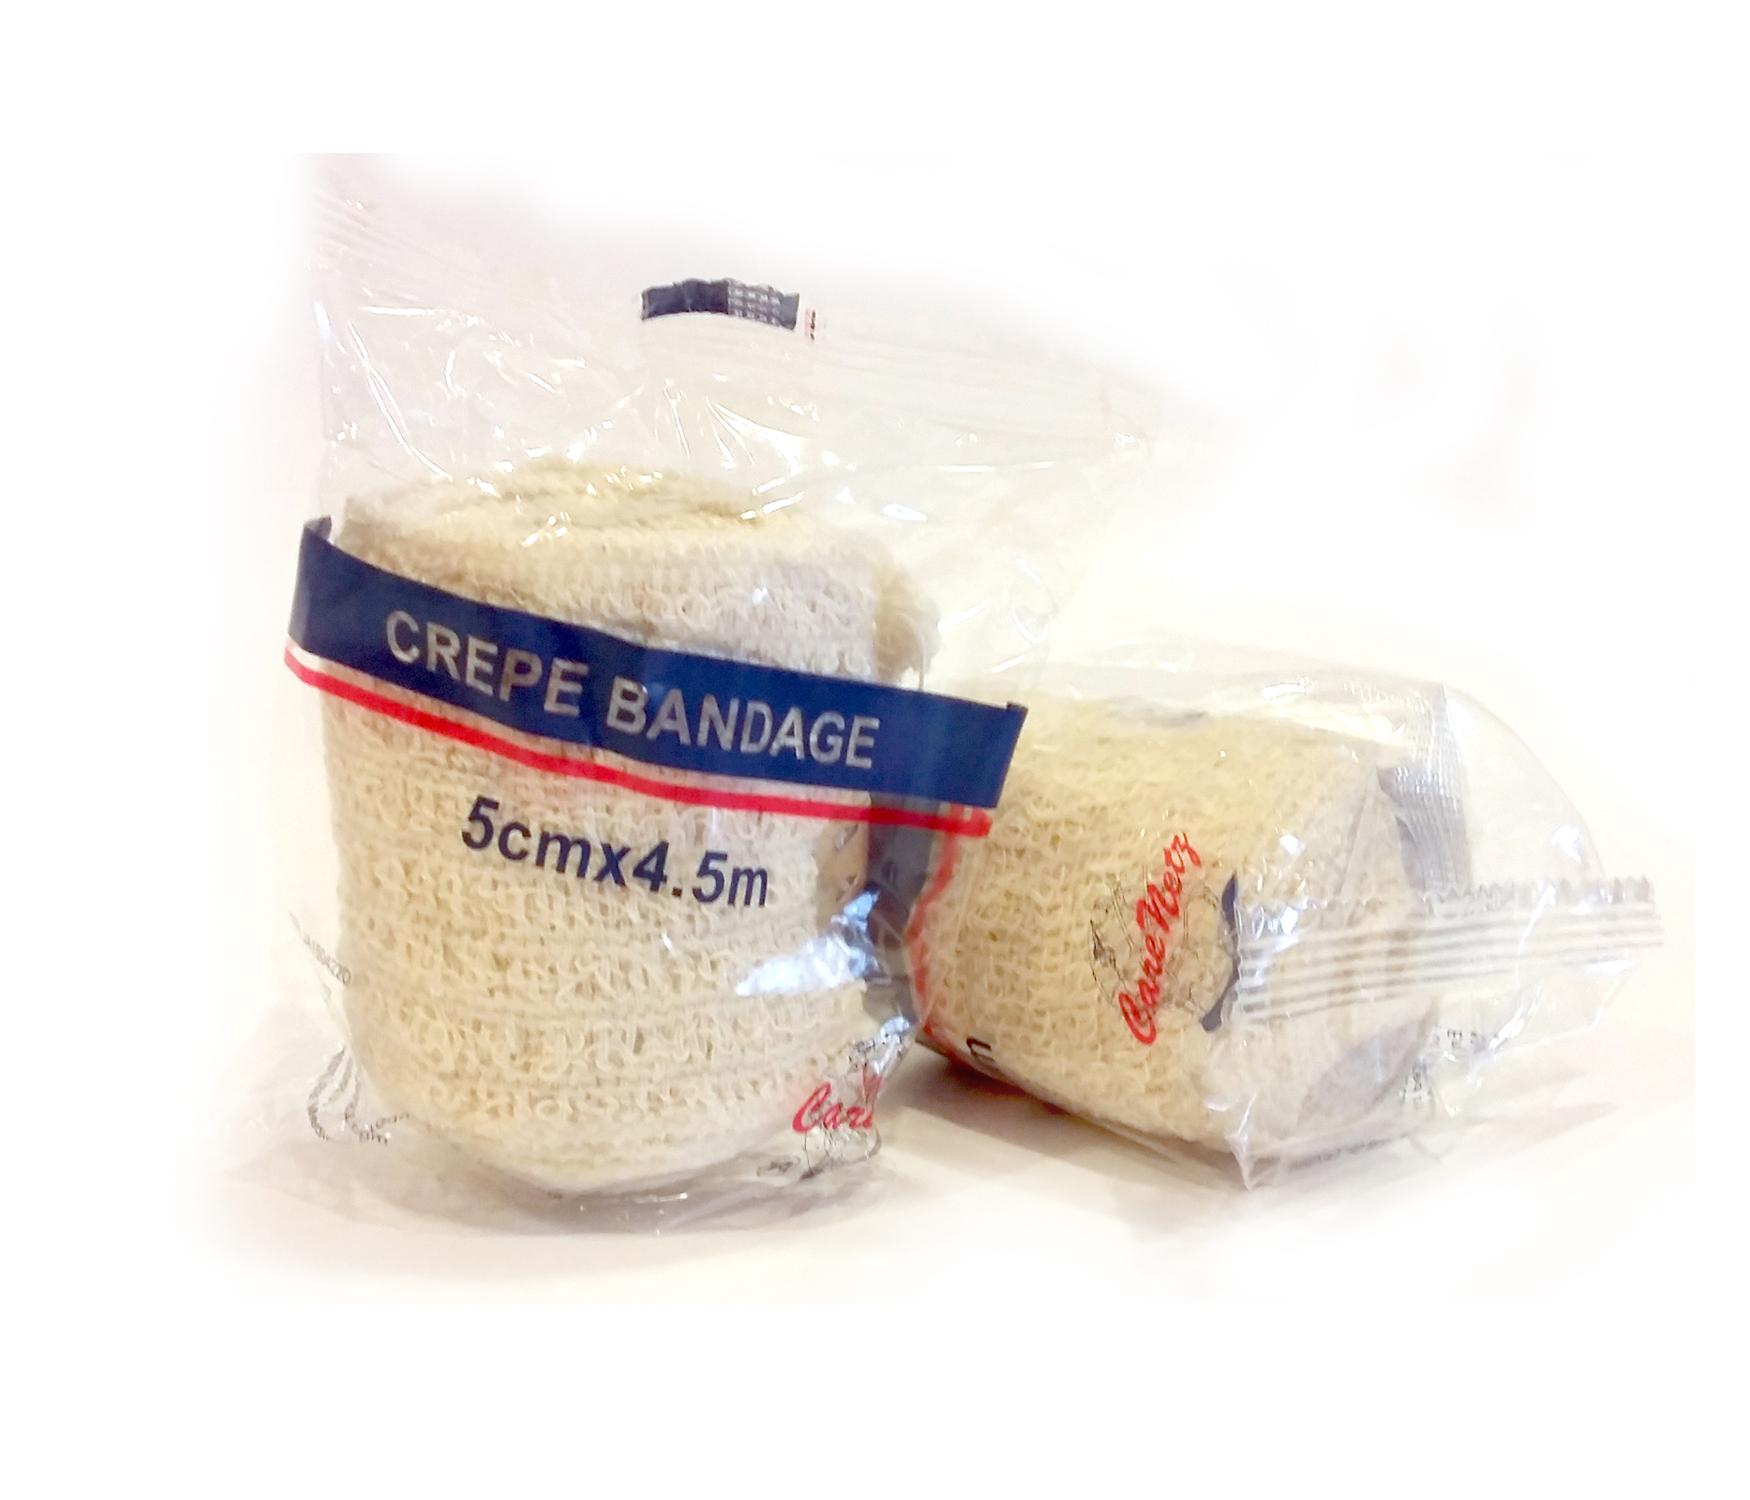 Confirming Bandage 30g/m2_2